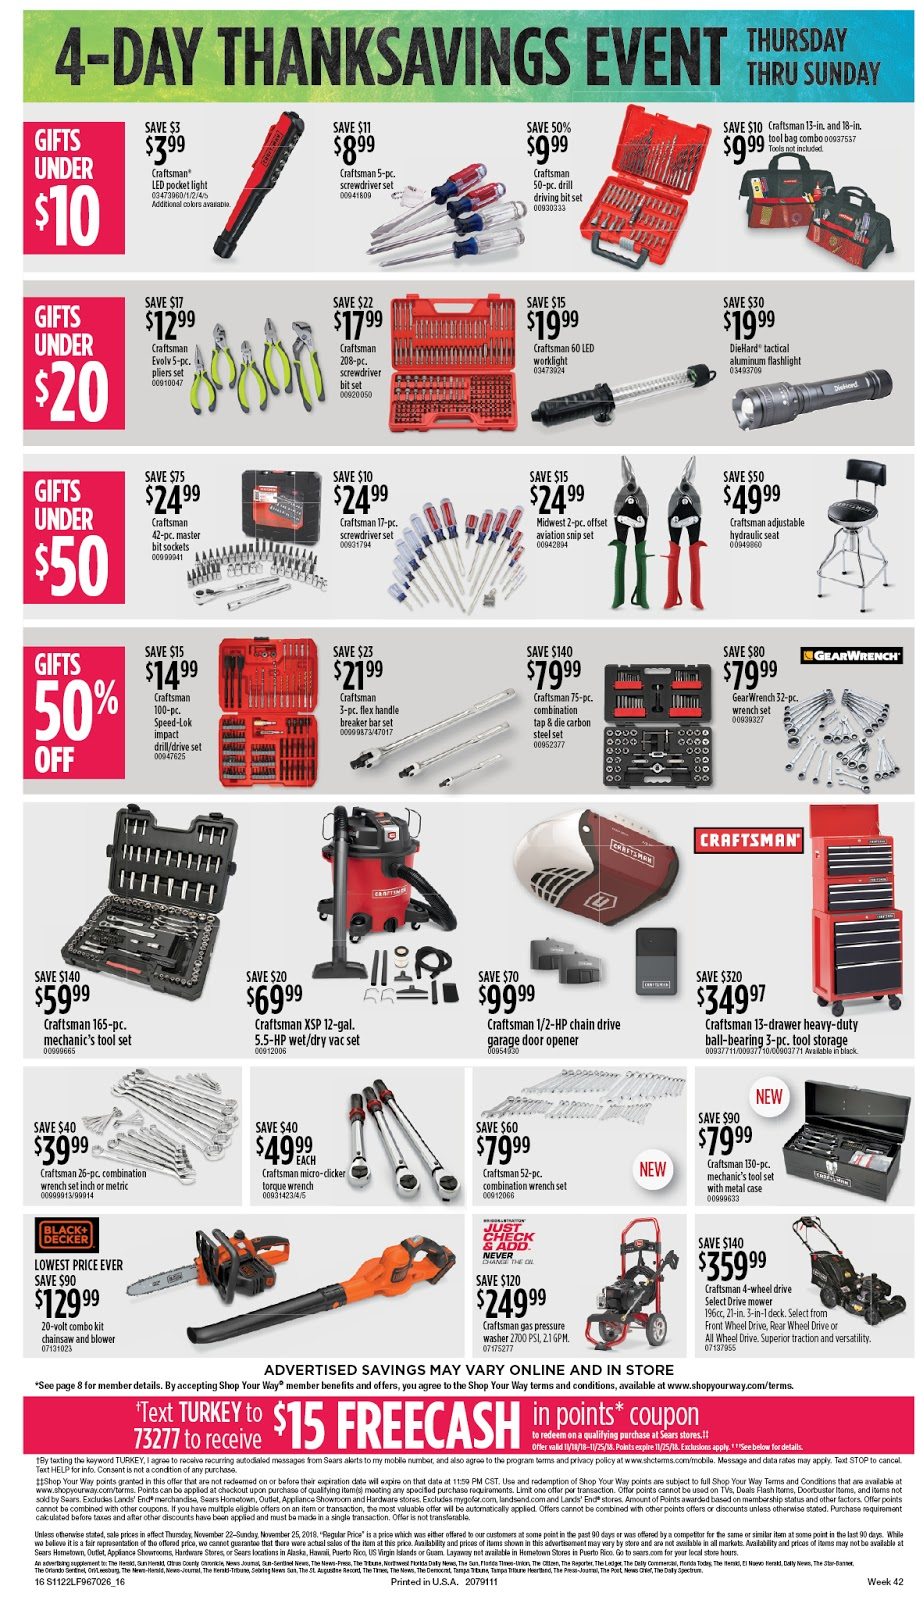 Sears Black Friday tools 2018 ad